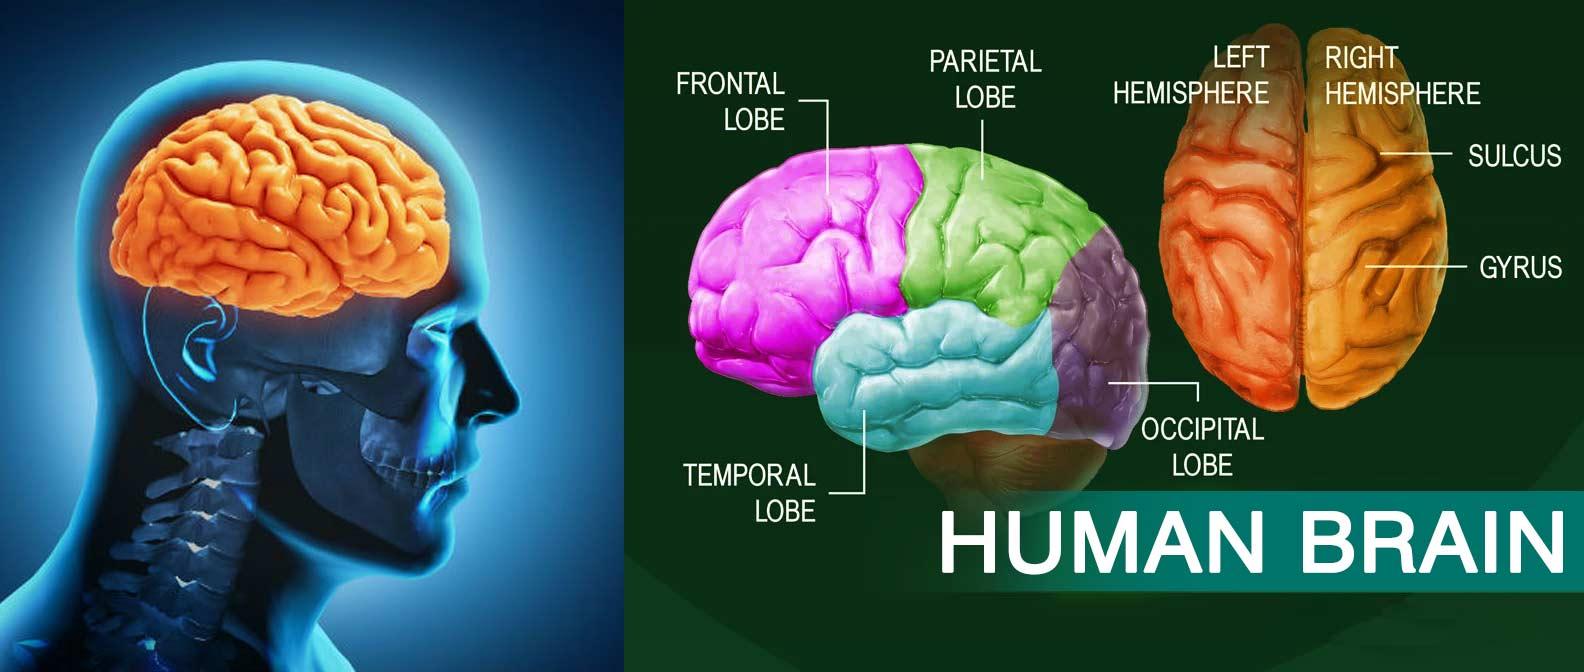 human-brain-anatomy-system